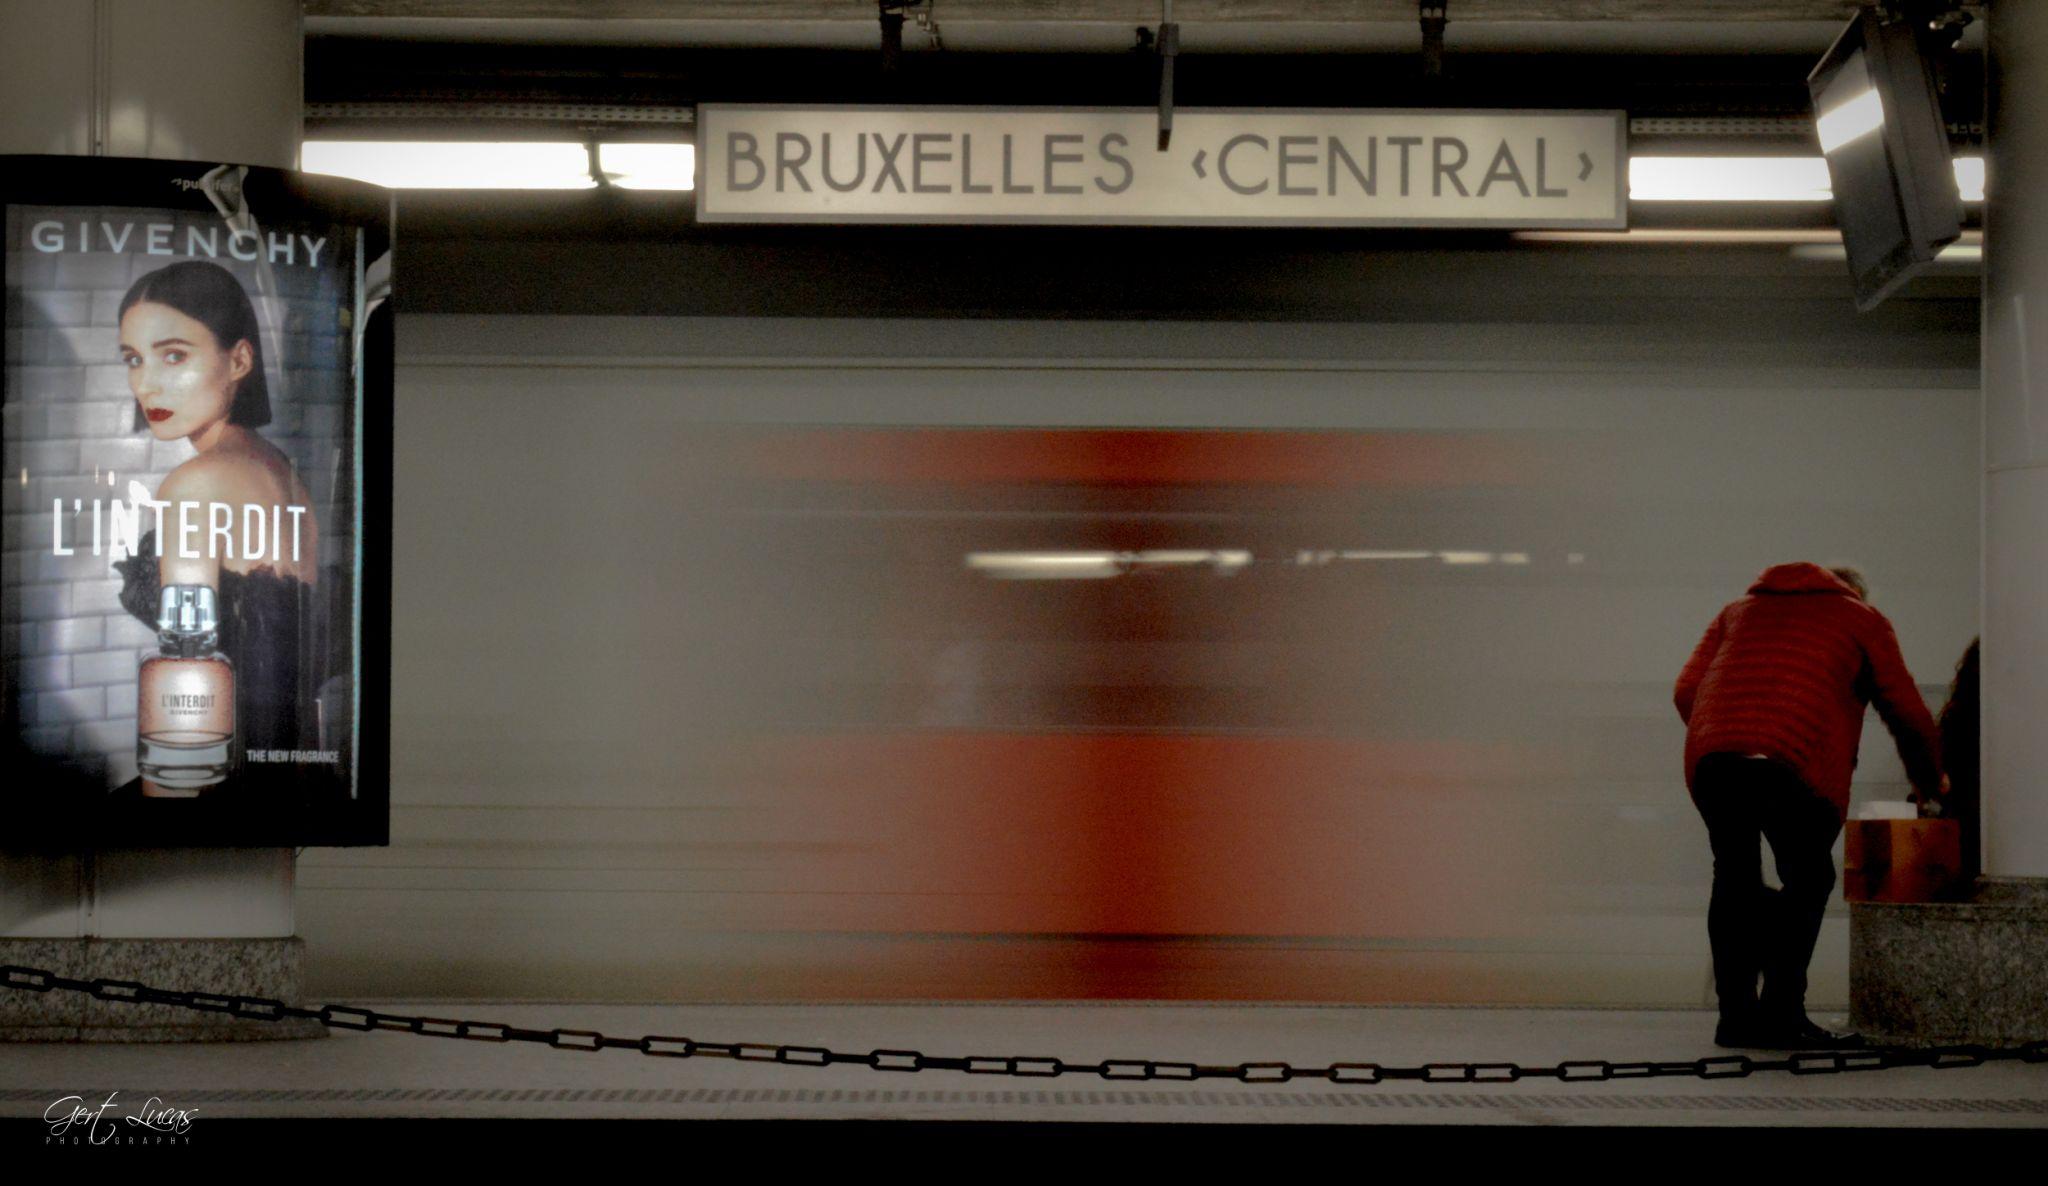 Brussels central trainstation, Belgium